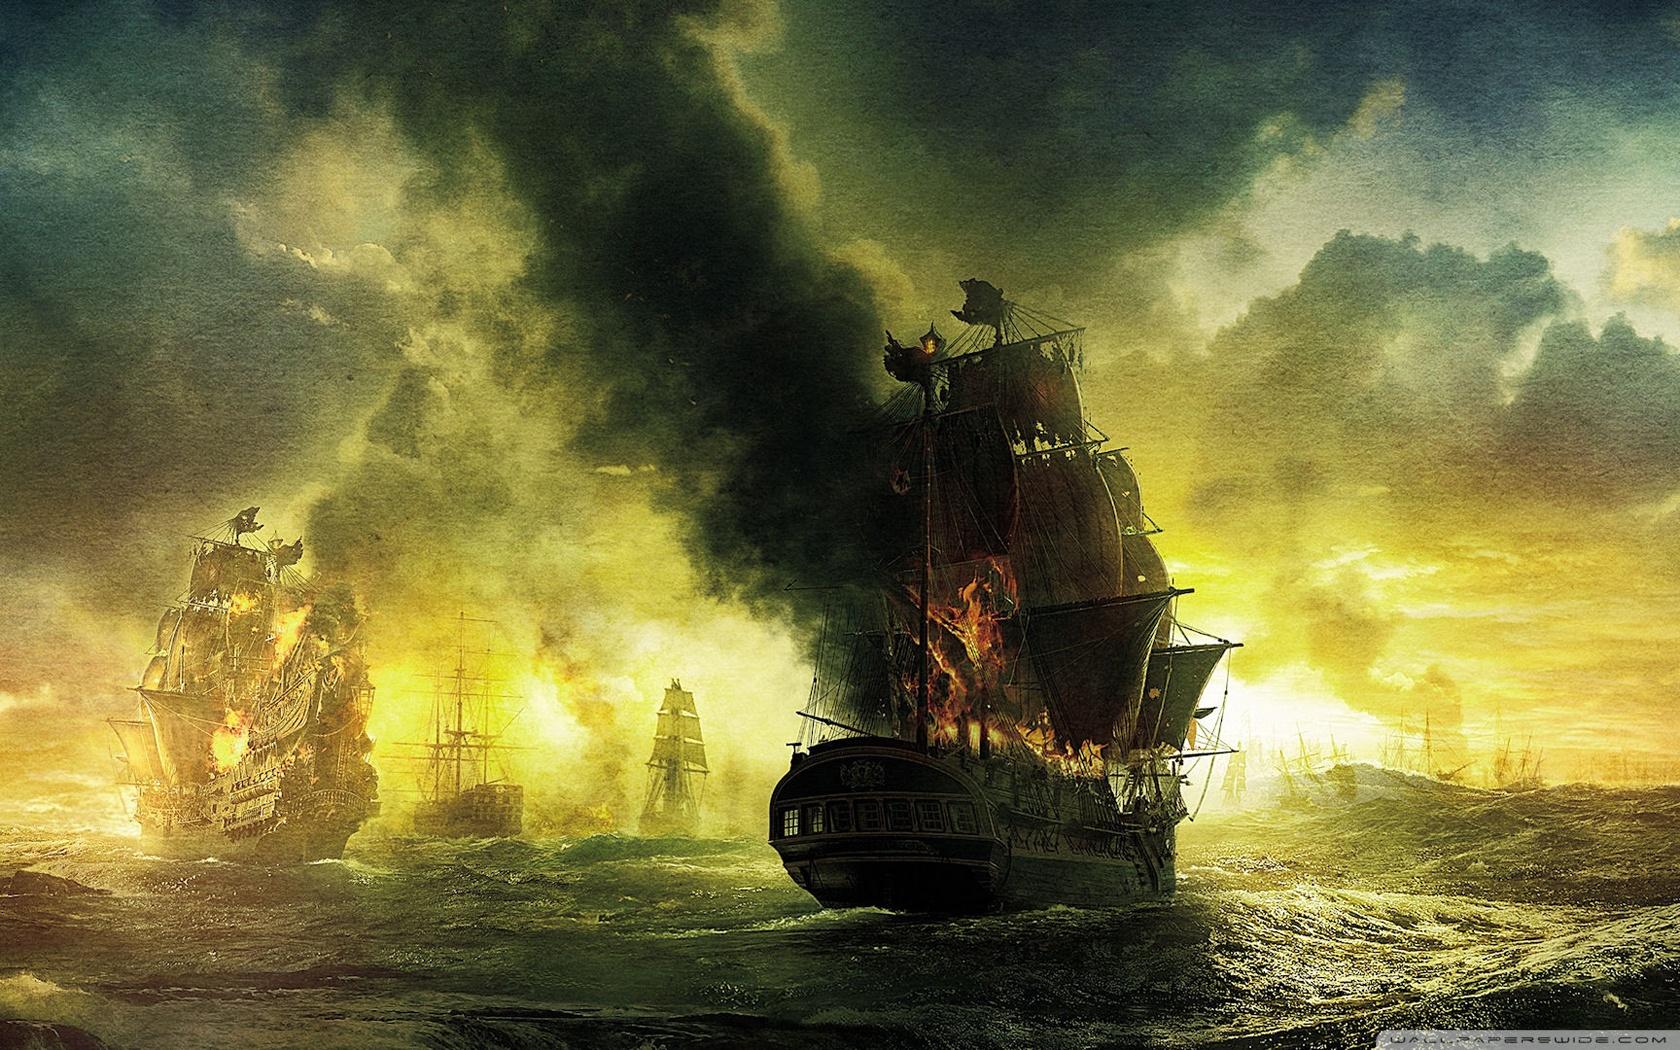 Hot New Movies/cars Images Piraten Der Karibik Hd Wallpaper - Pirates Of The Caribbean Fond , HD Wallpaper & Backgrounds